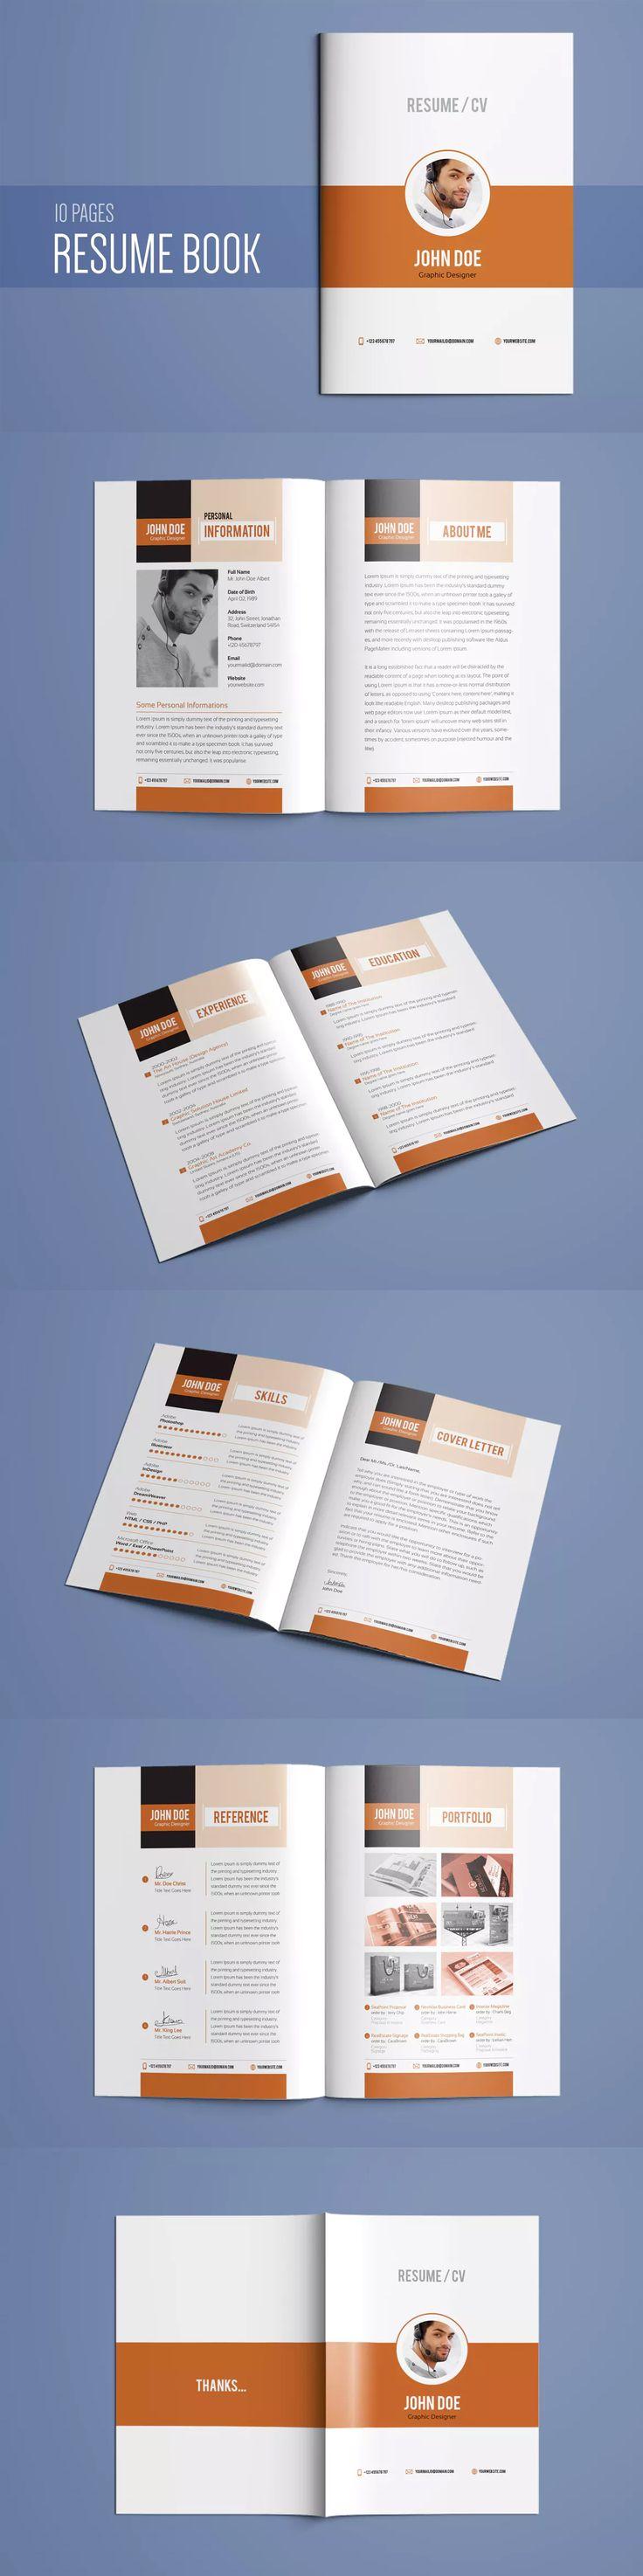 102 best Resume / CV Design Templates images on Pinterest